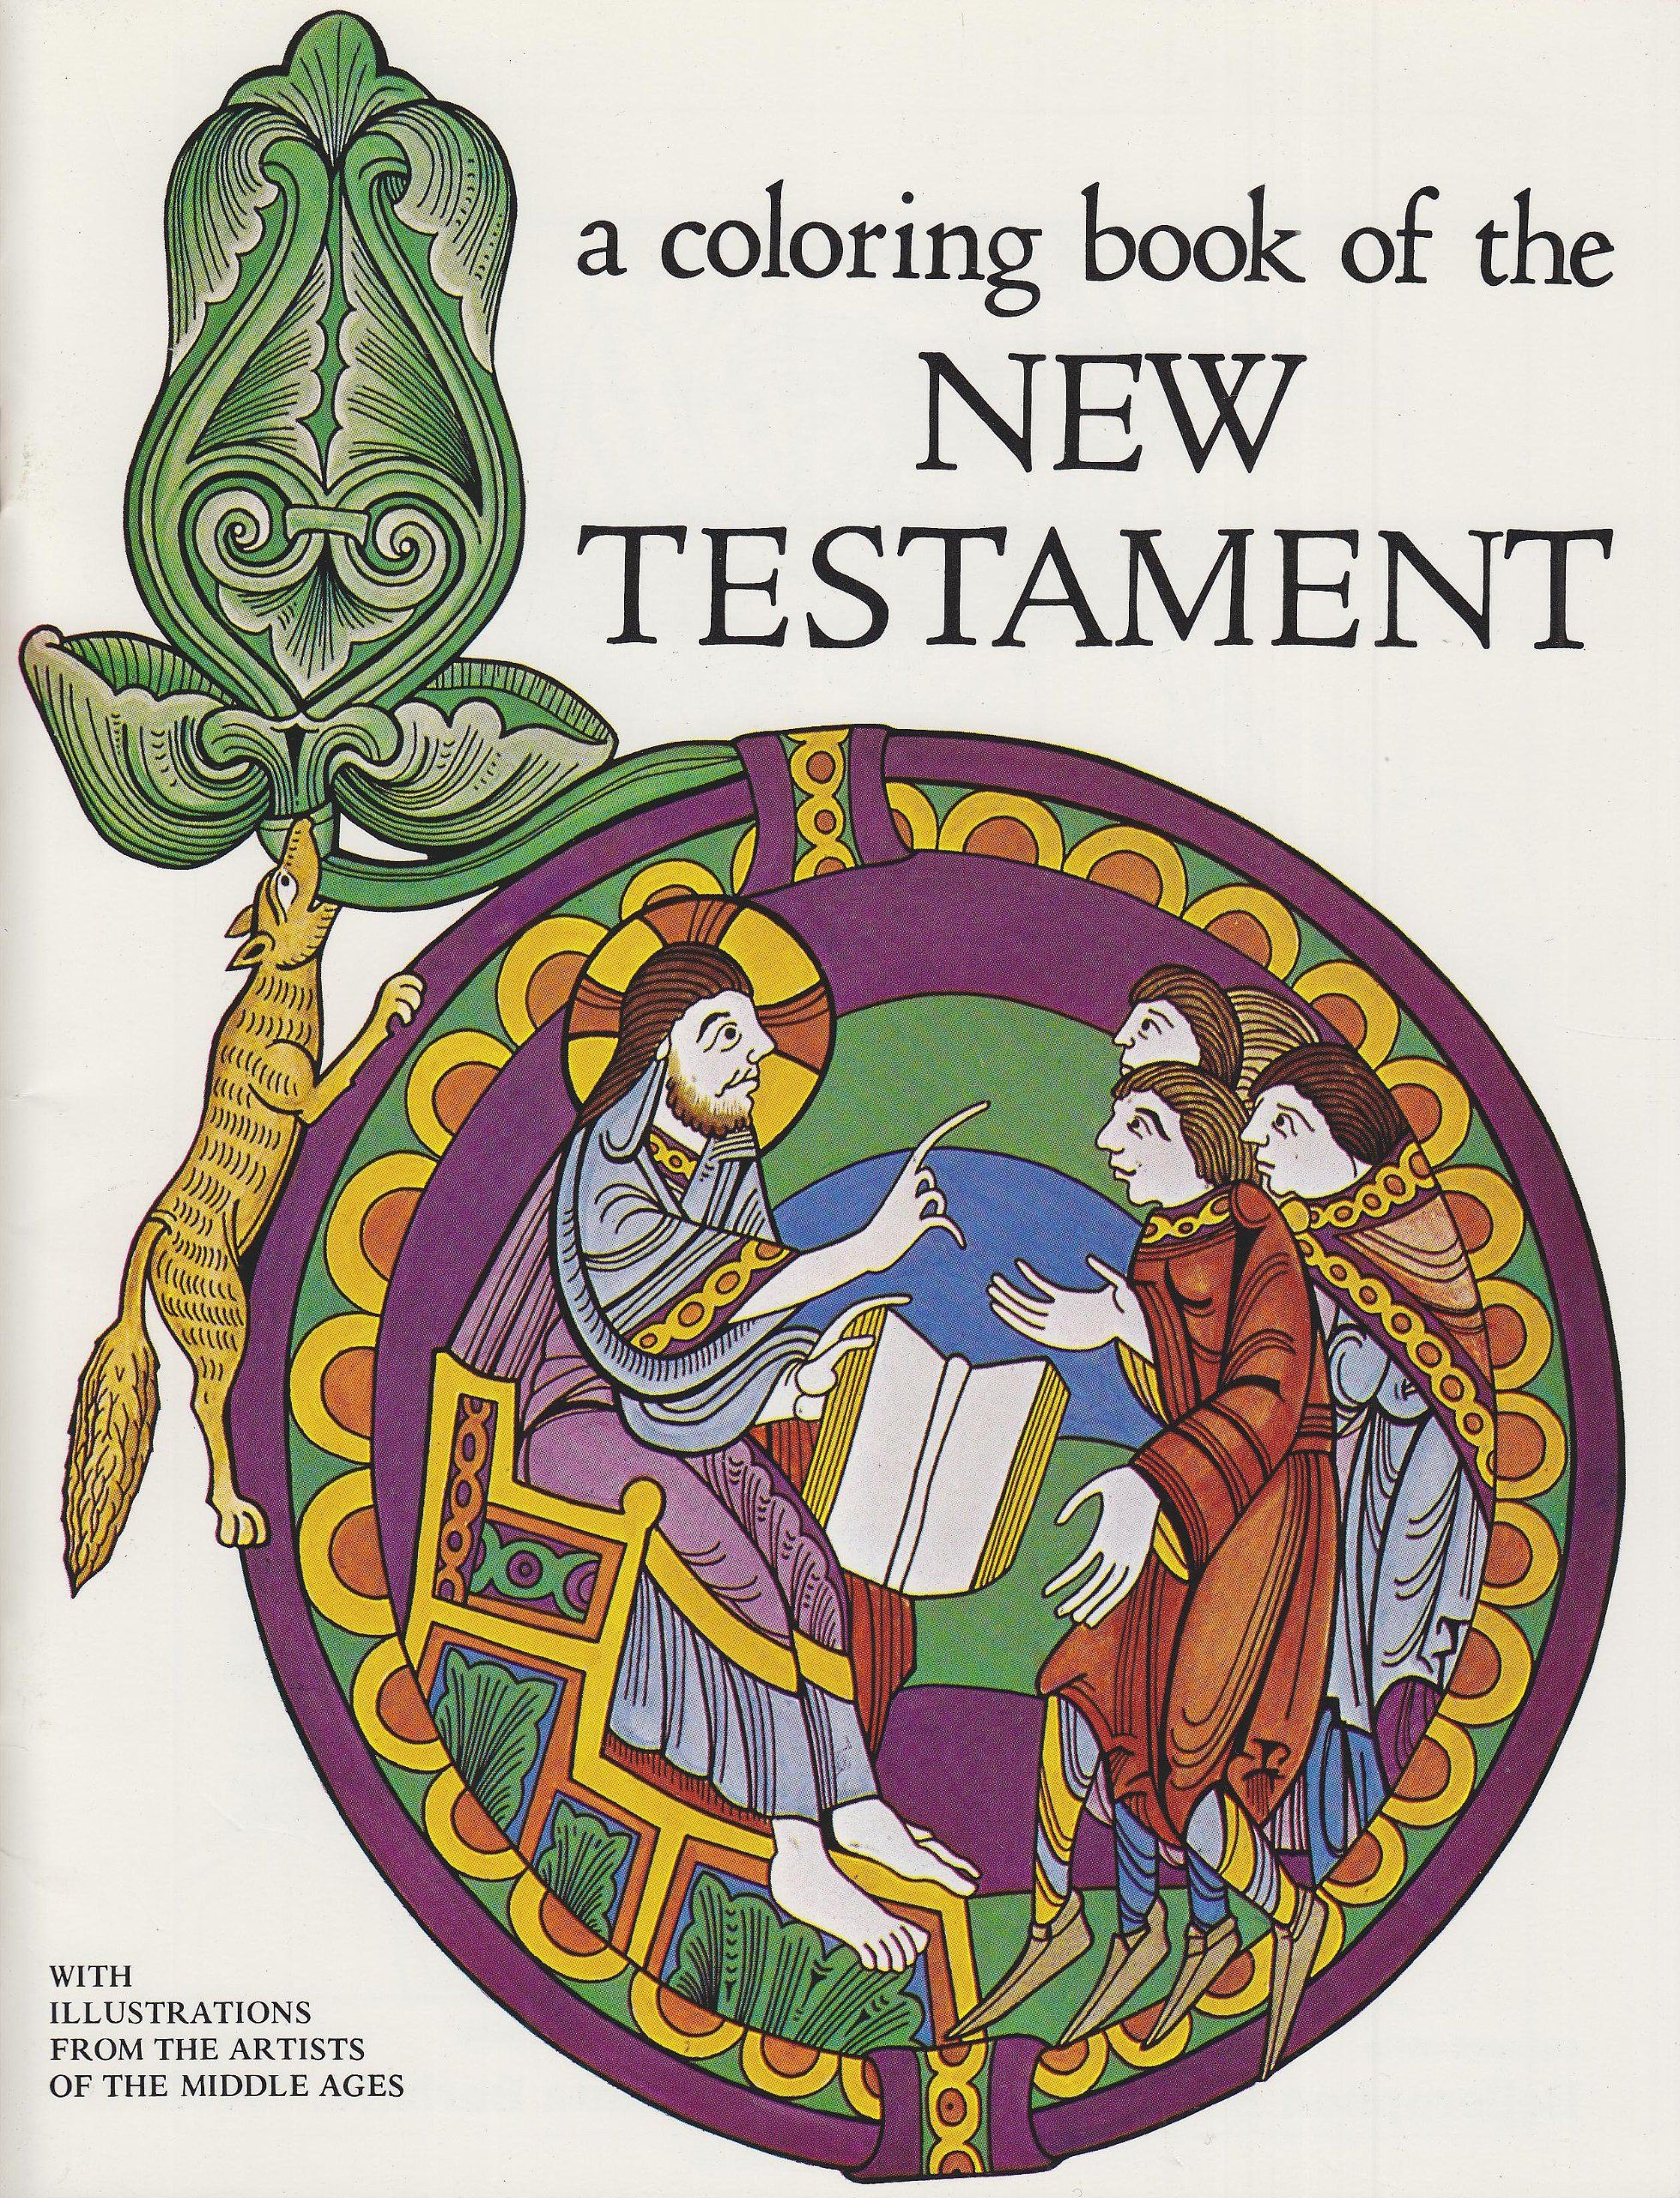 A Coloring Book Of The New Testament Amazon De Bellerophon Books Fremdsprachige Bucher Wenn Du Mal Buch Bucher Buchregal